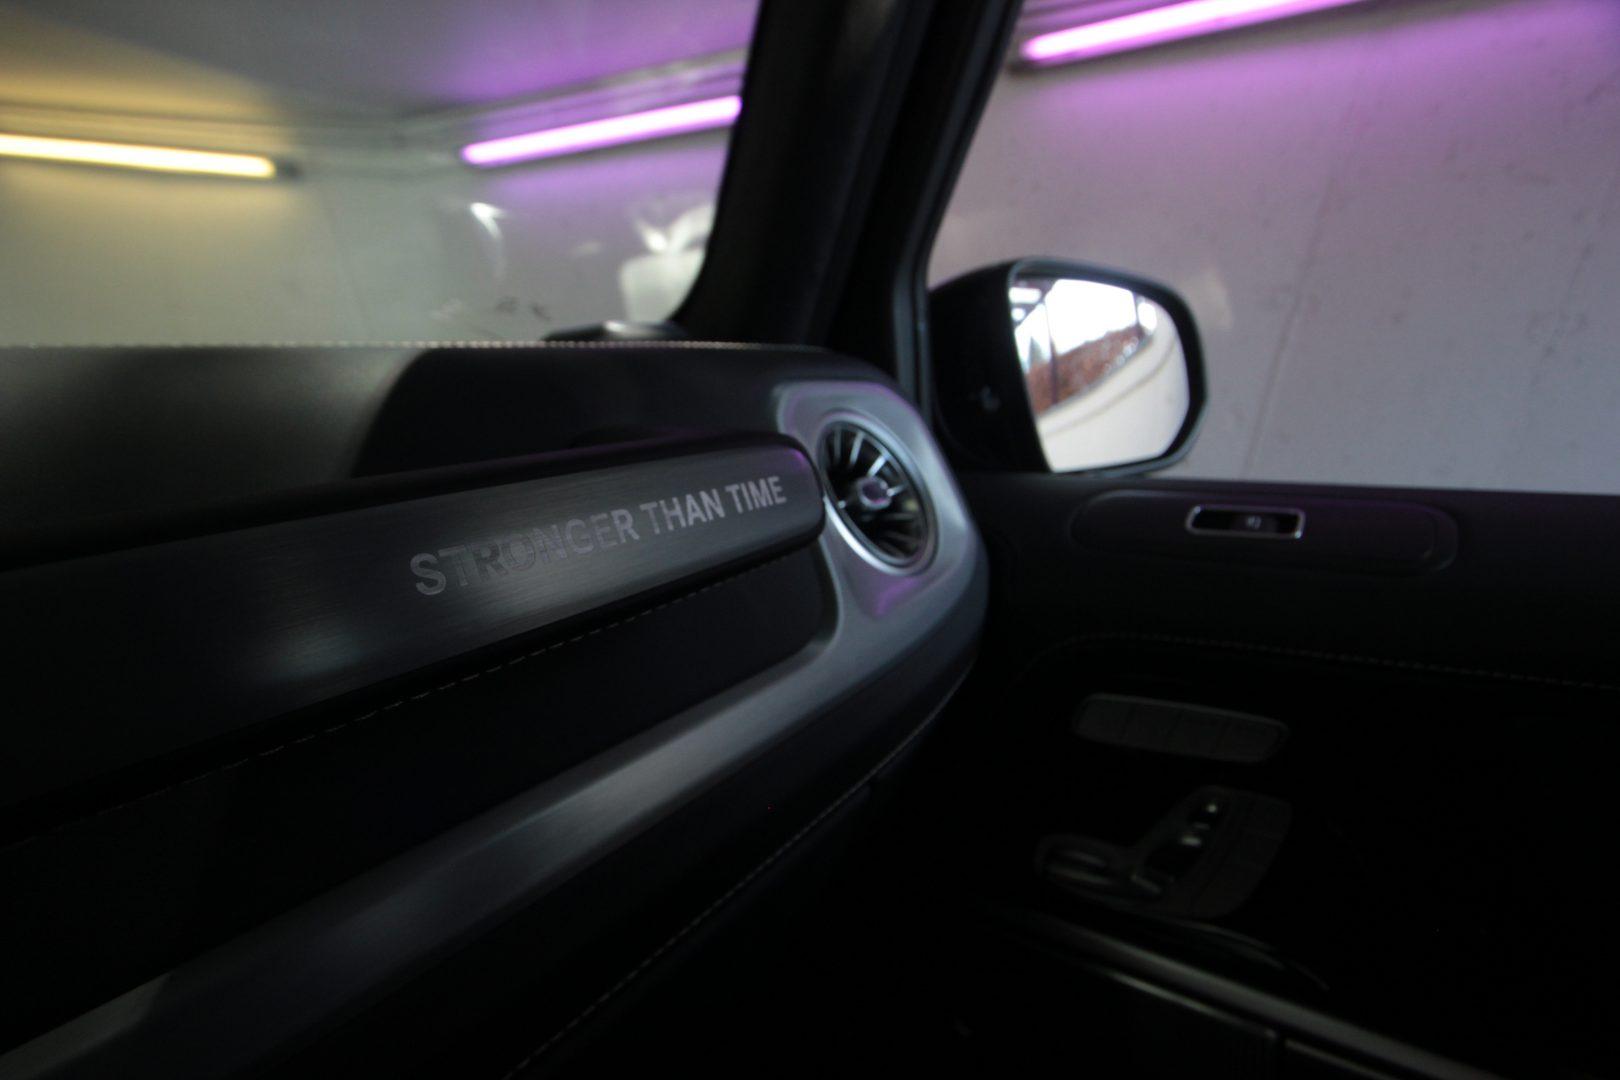 AIL Mercedes-Benz G 400 d Stronger than time Edition 14